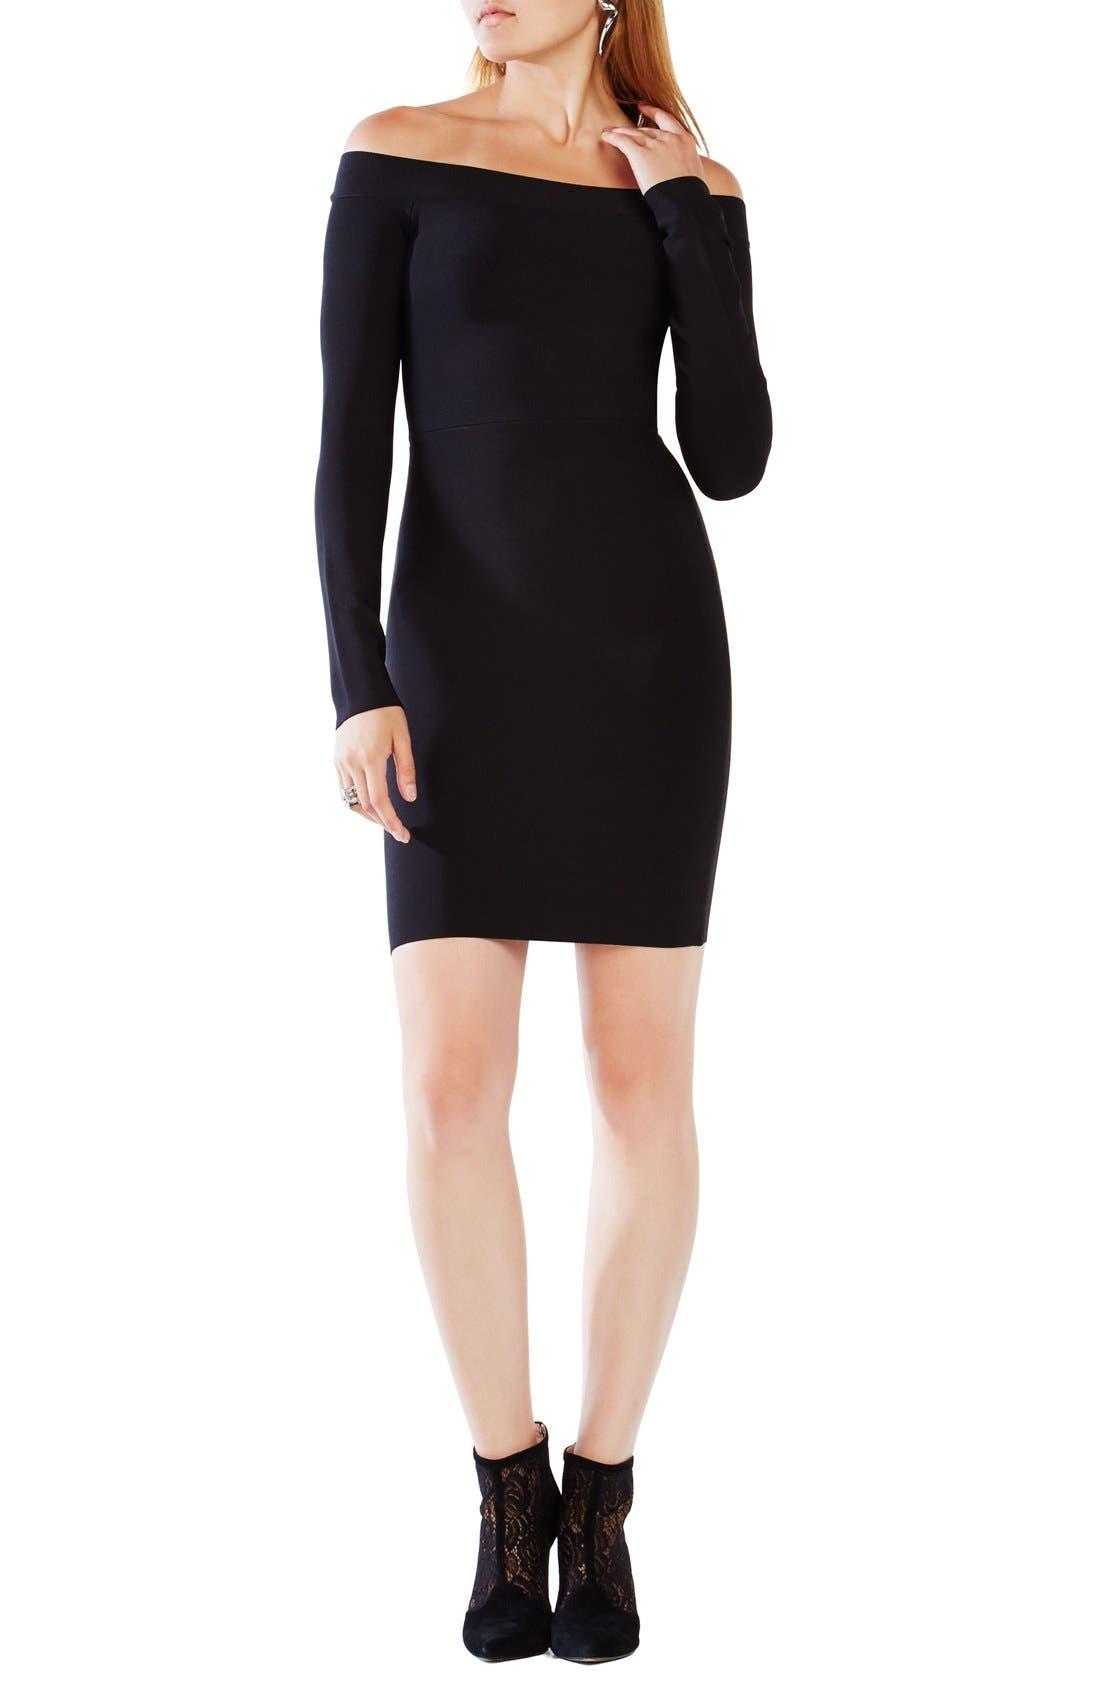 Main Image - BCBGMAXAZRIA 'Annabeth' Off the Shoulder Body-Con Dress